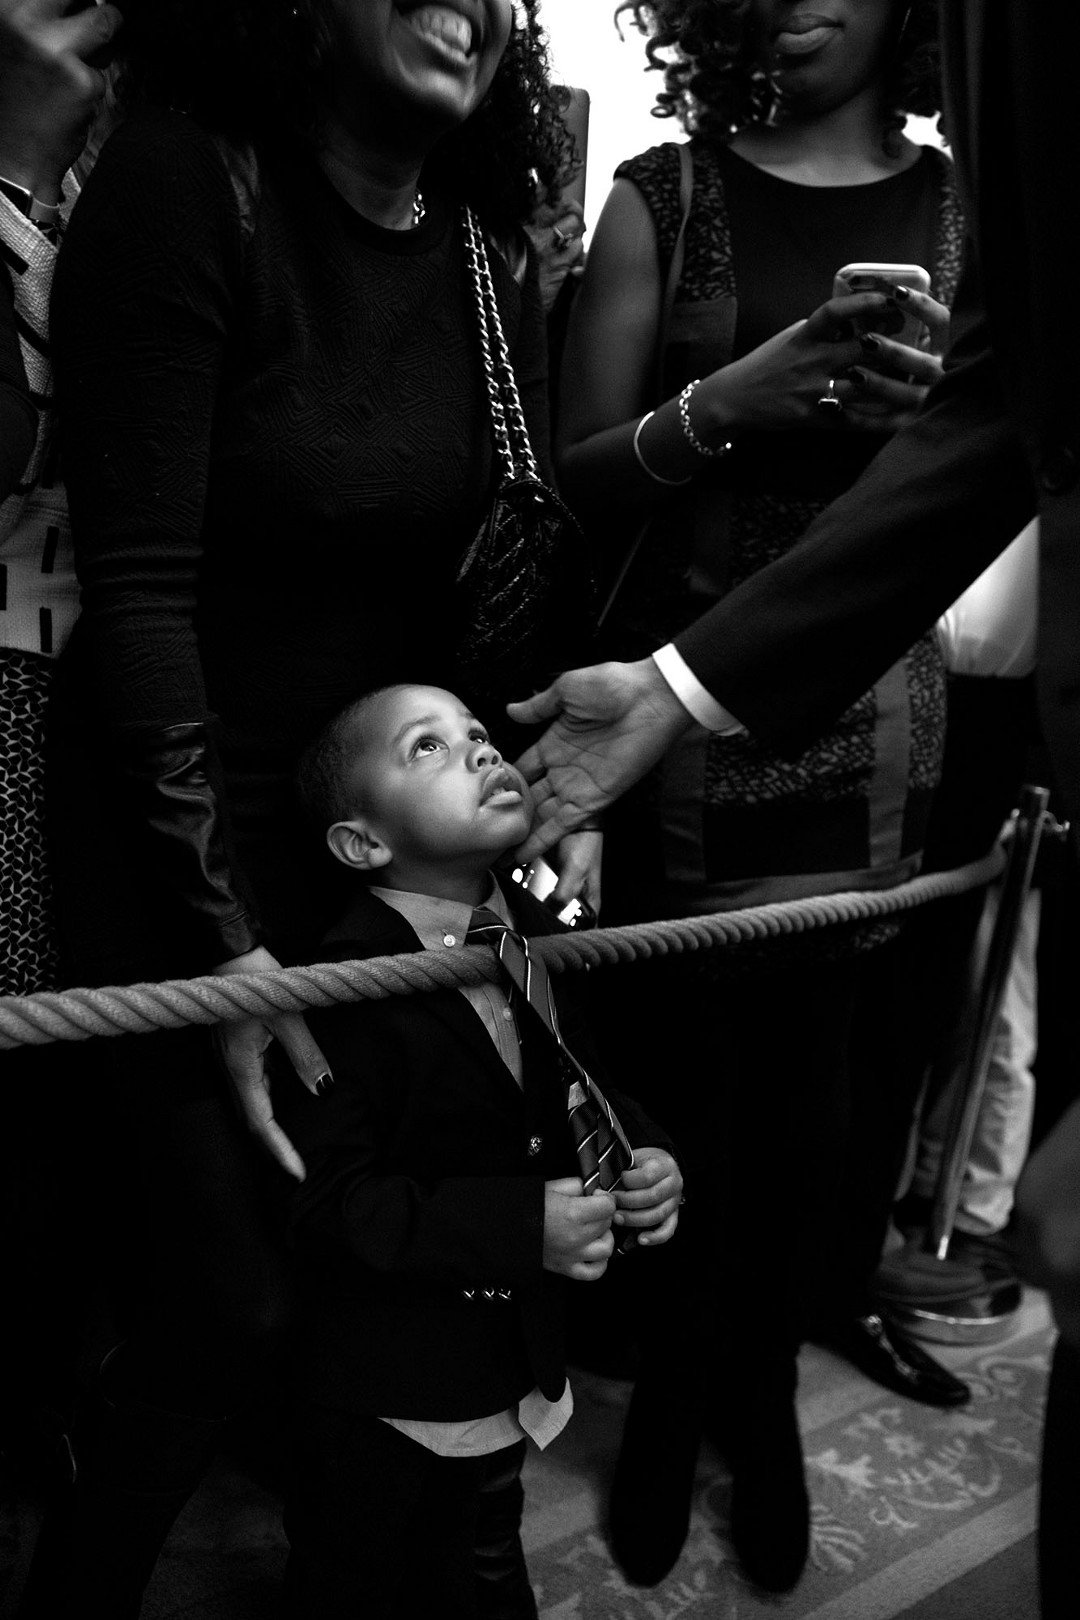 obama-small-child